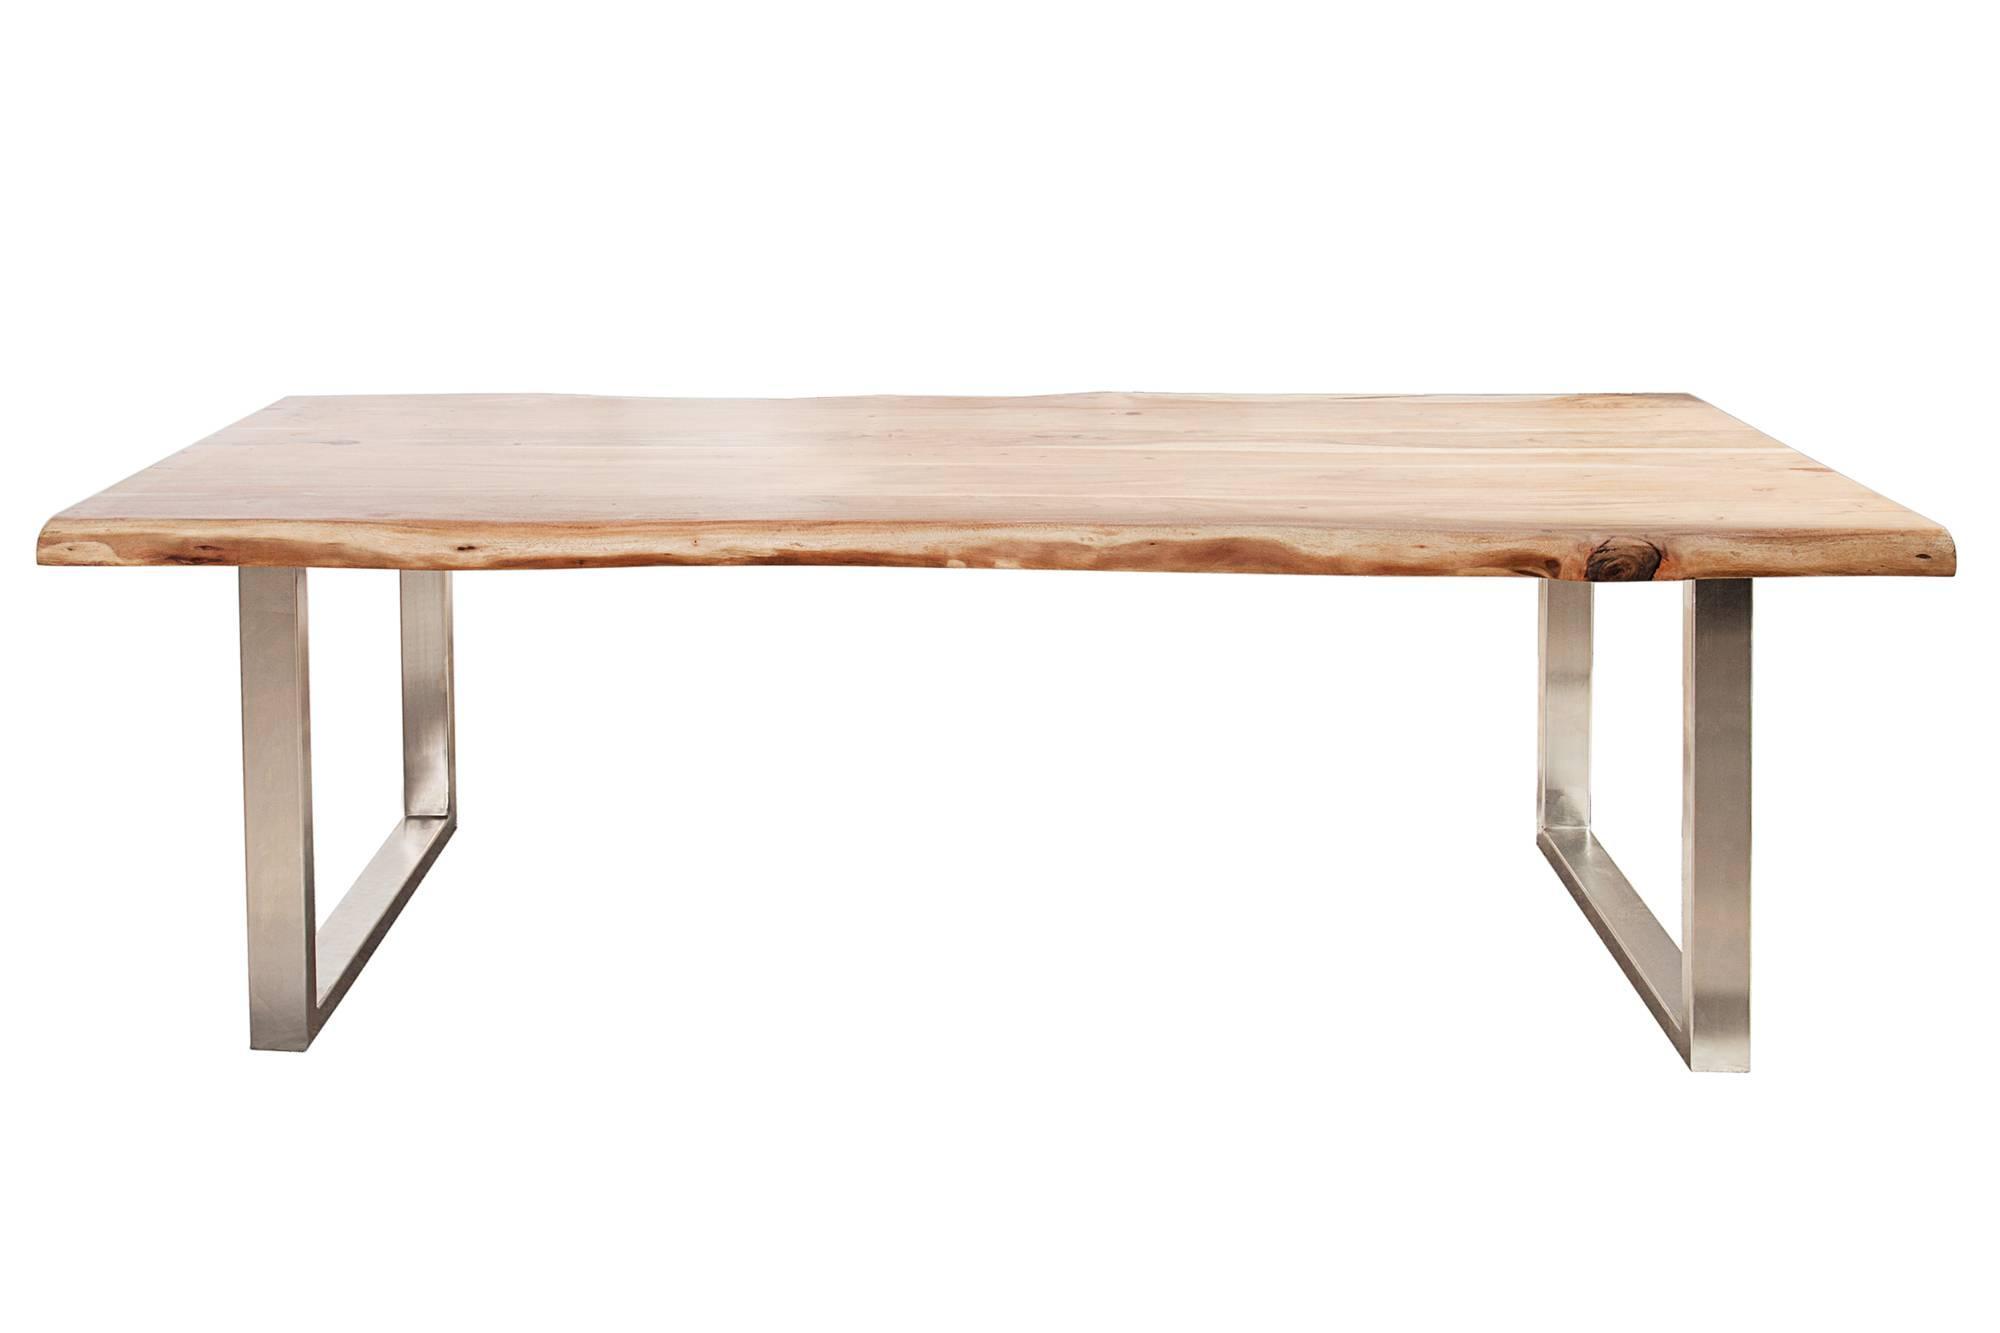 Luxusný jedálenský stôl z masívu Massive II New 240cm